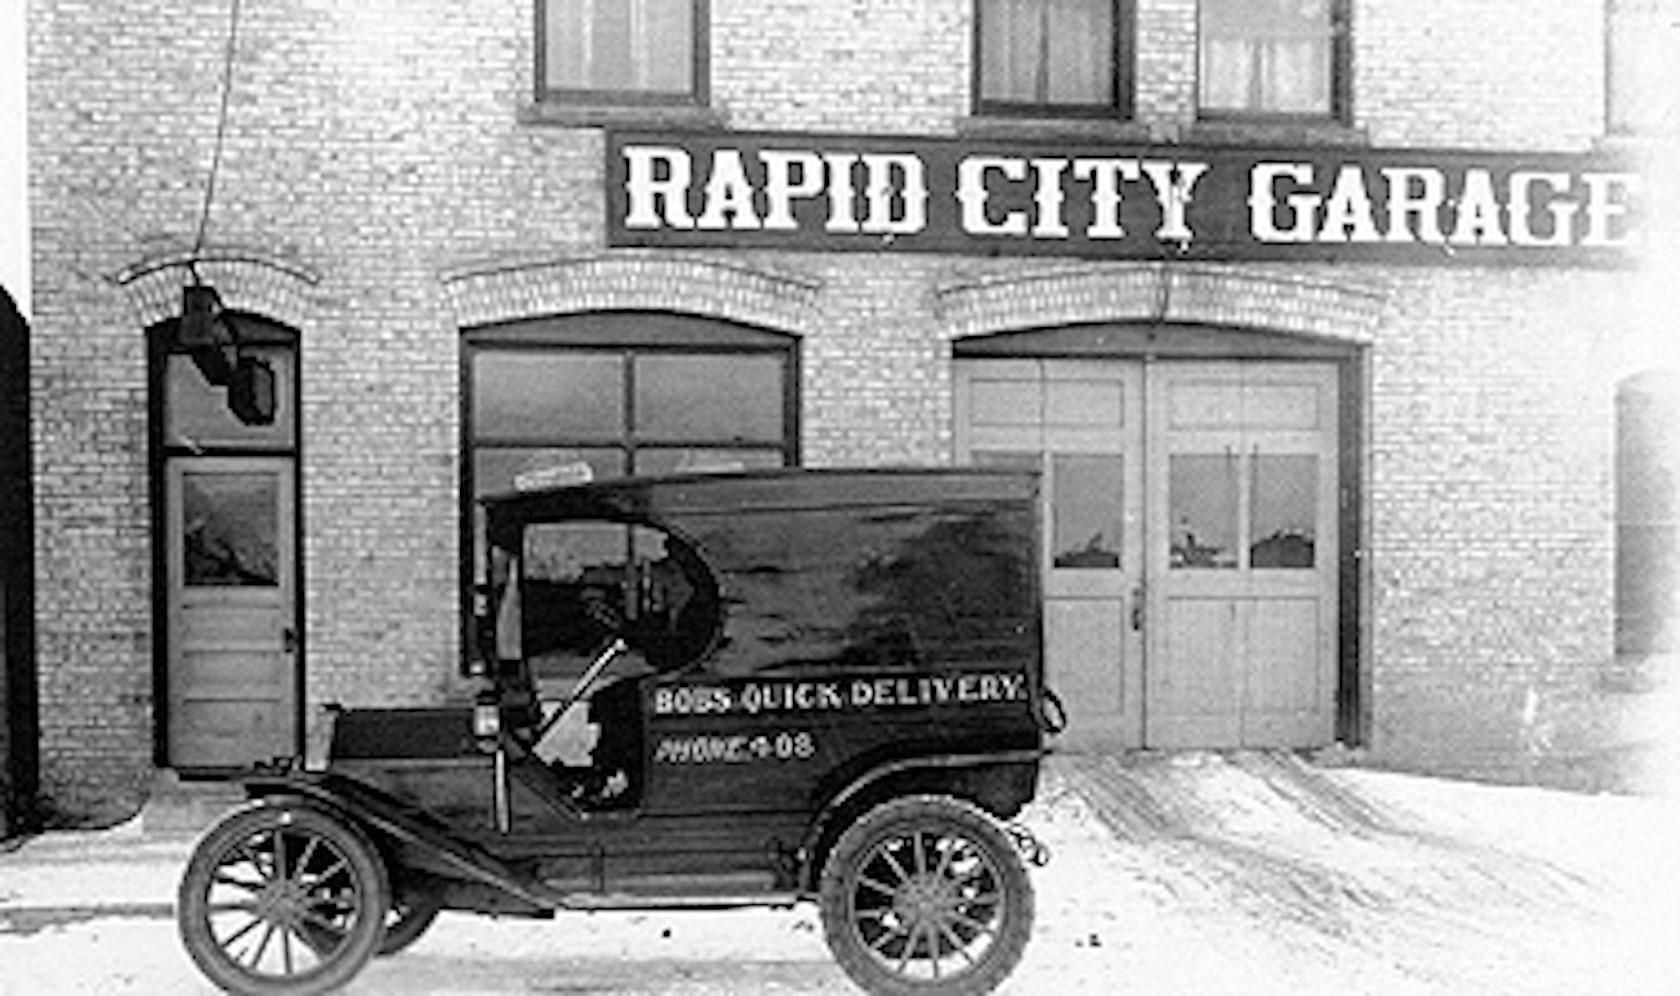 Rapid city garage architizer for Garage auto city cadaujac